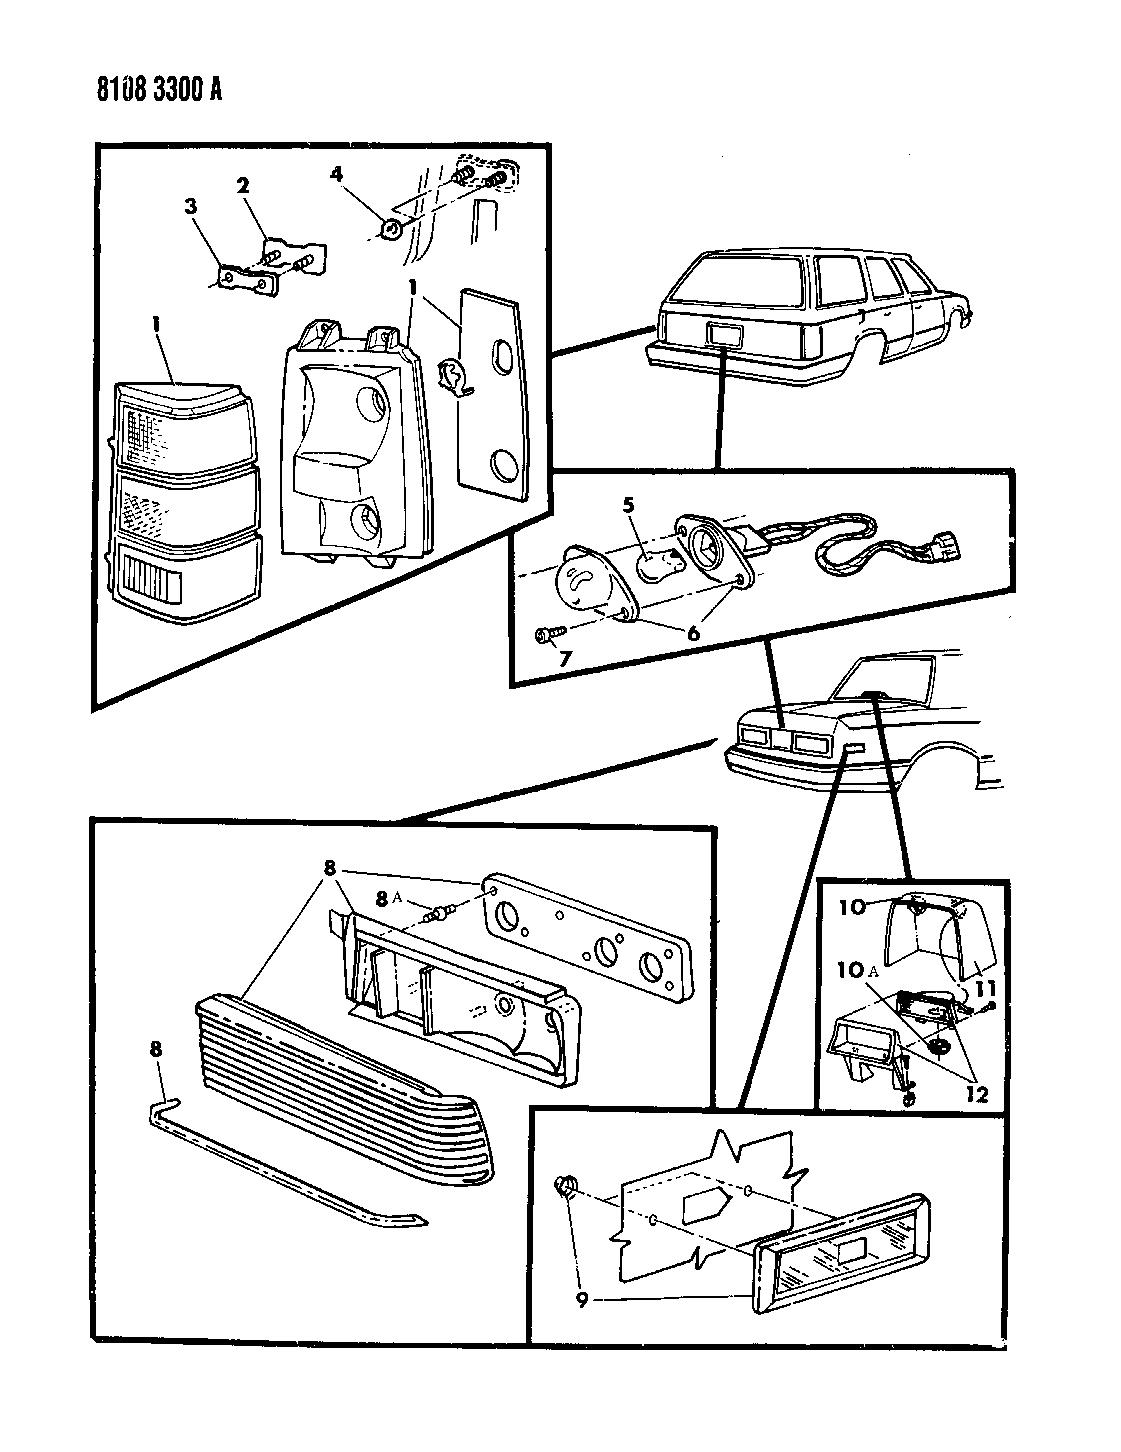 1988 dodge aries wiring diagram dodge aries wiring diagram